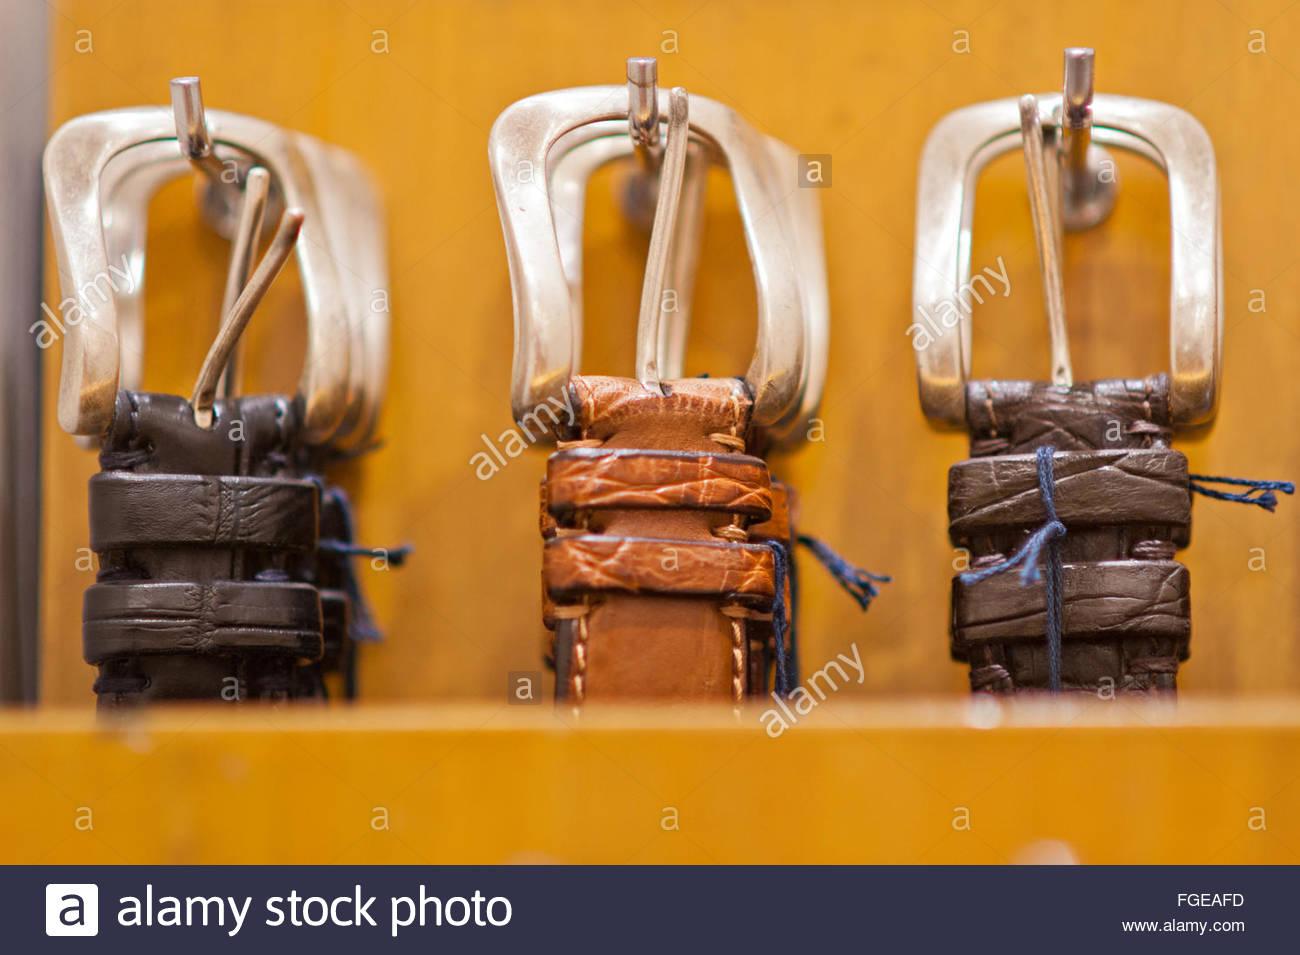 men's belts - Stock Image